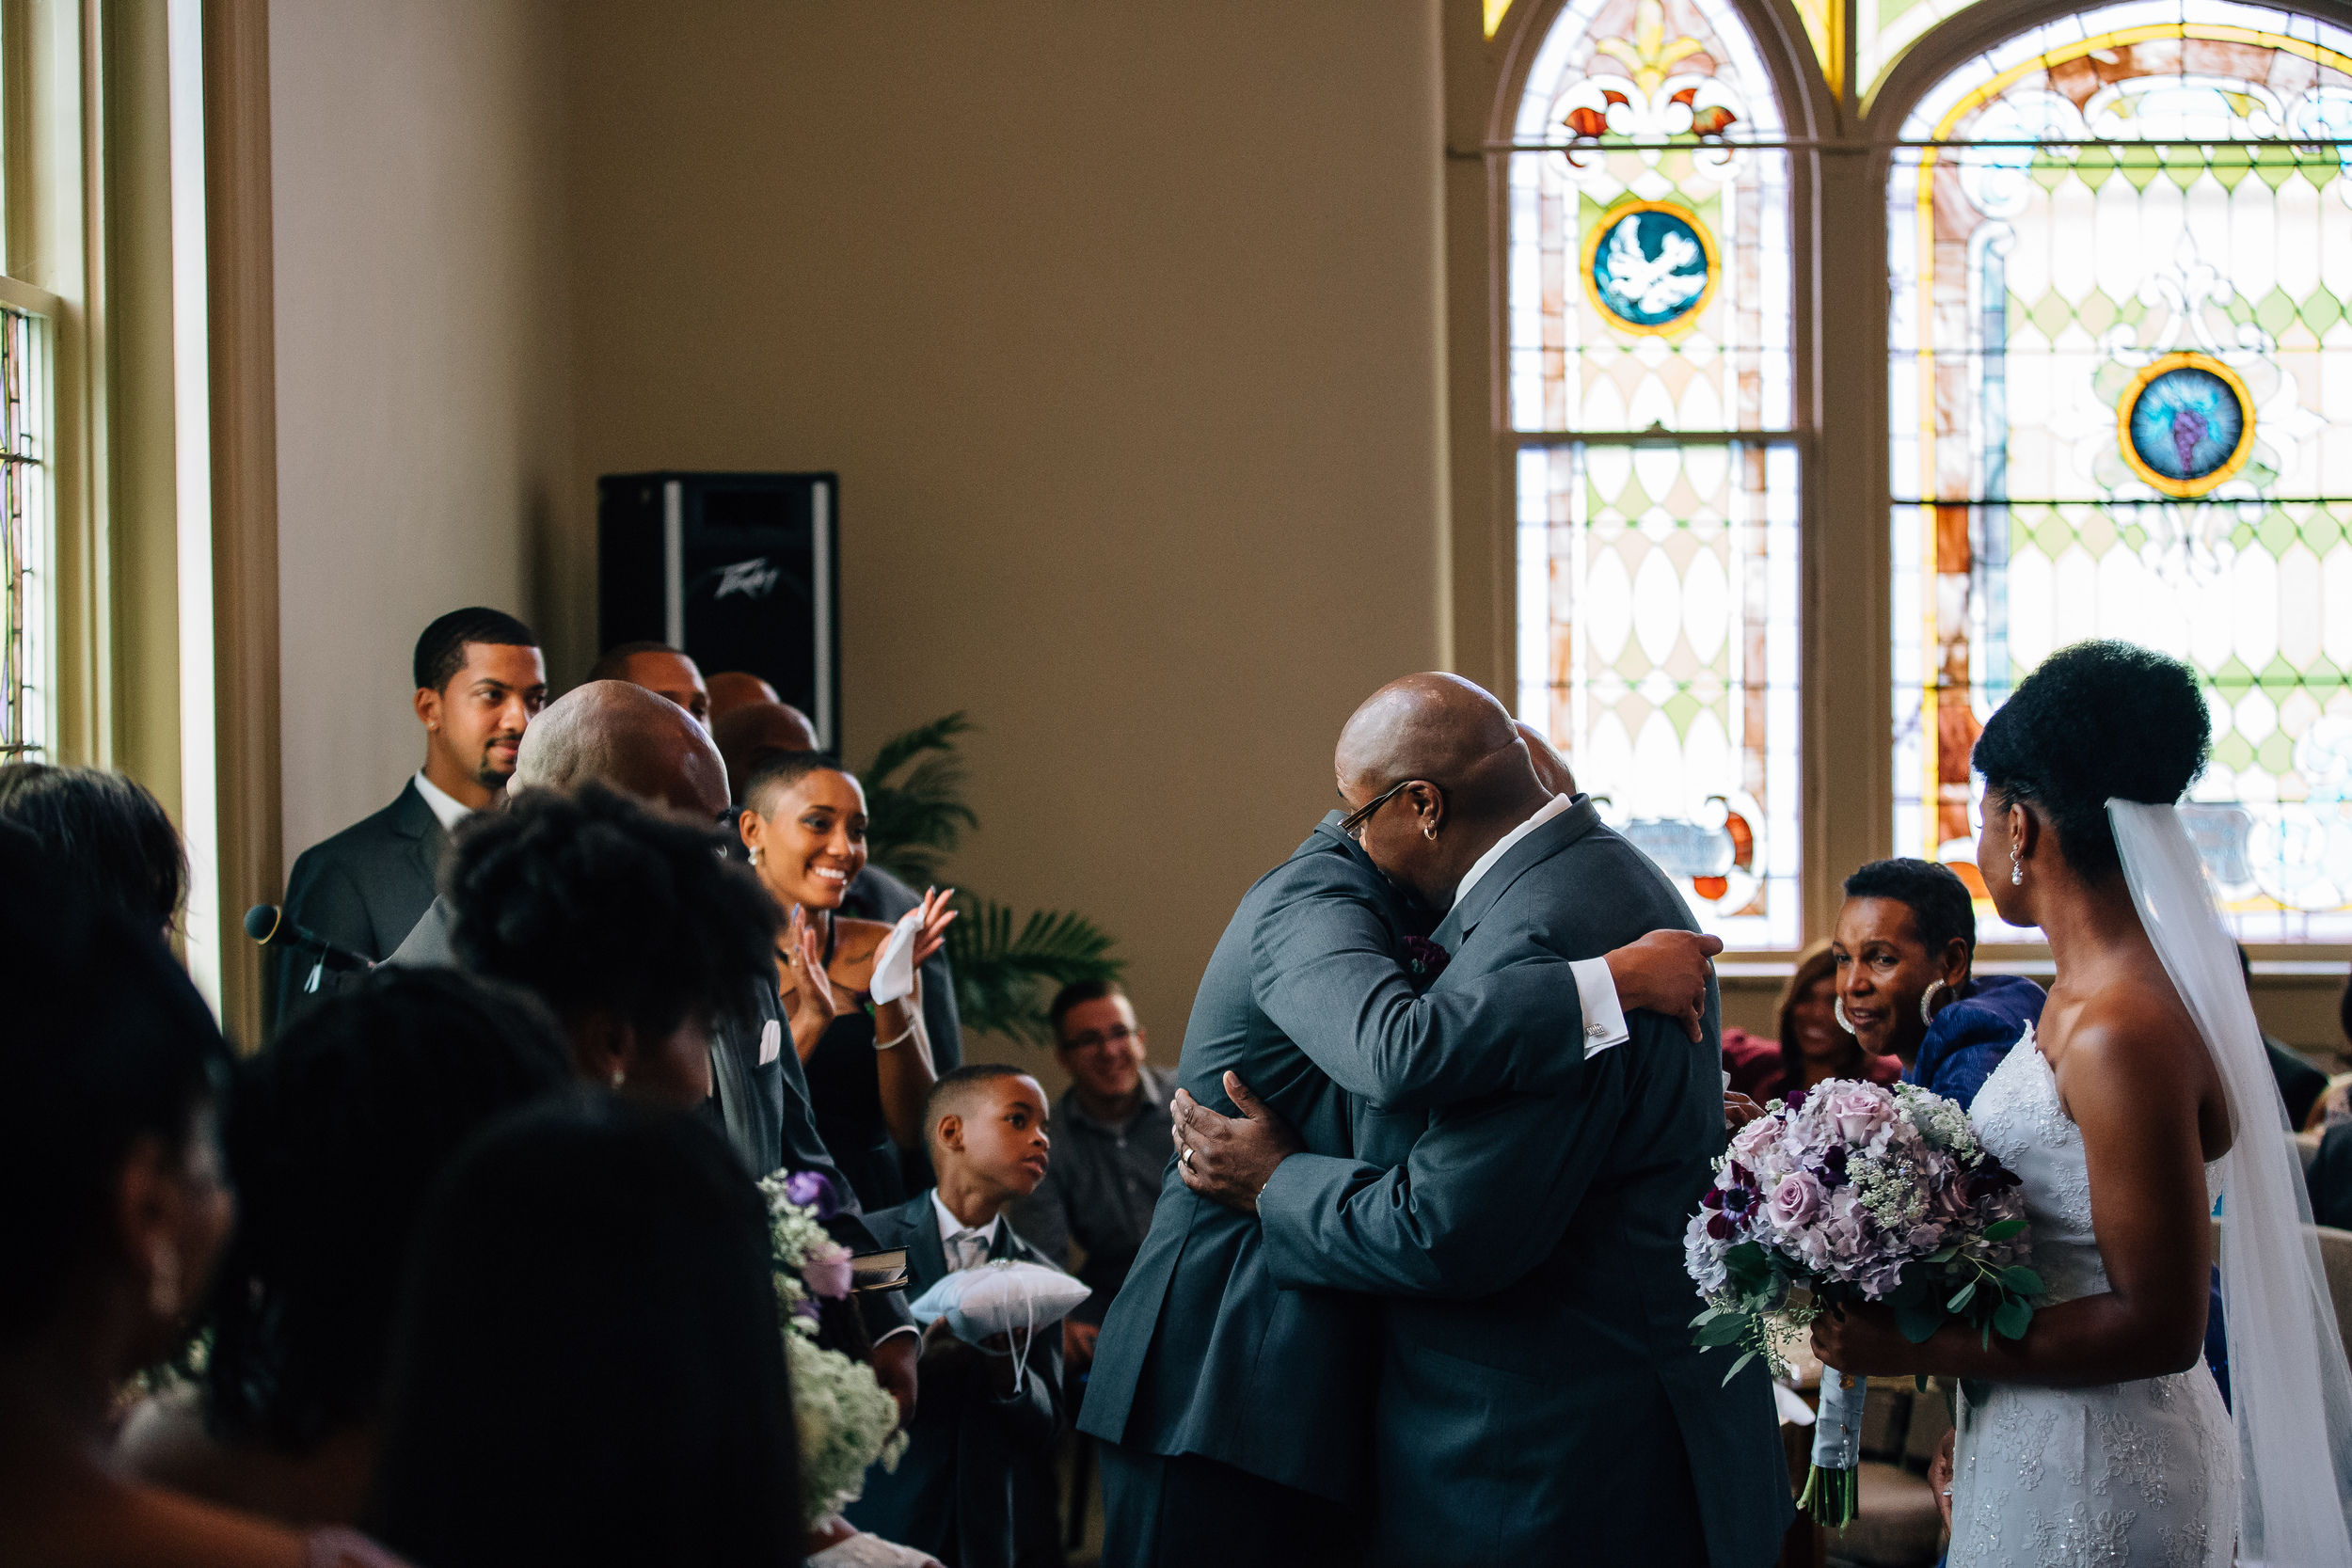 Chuck & Alicia's Wedding - Corrie Mick Photography-243.jpg